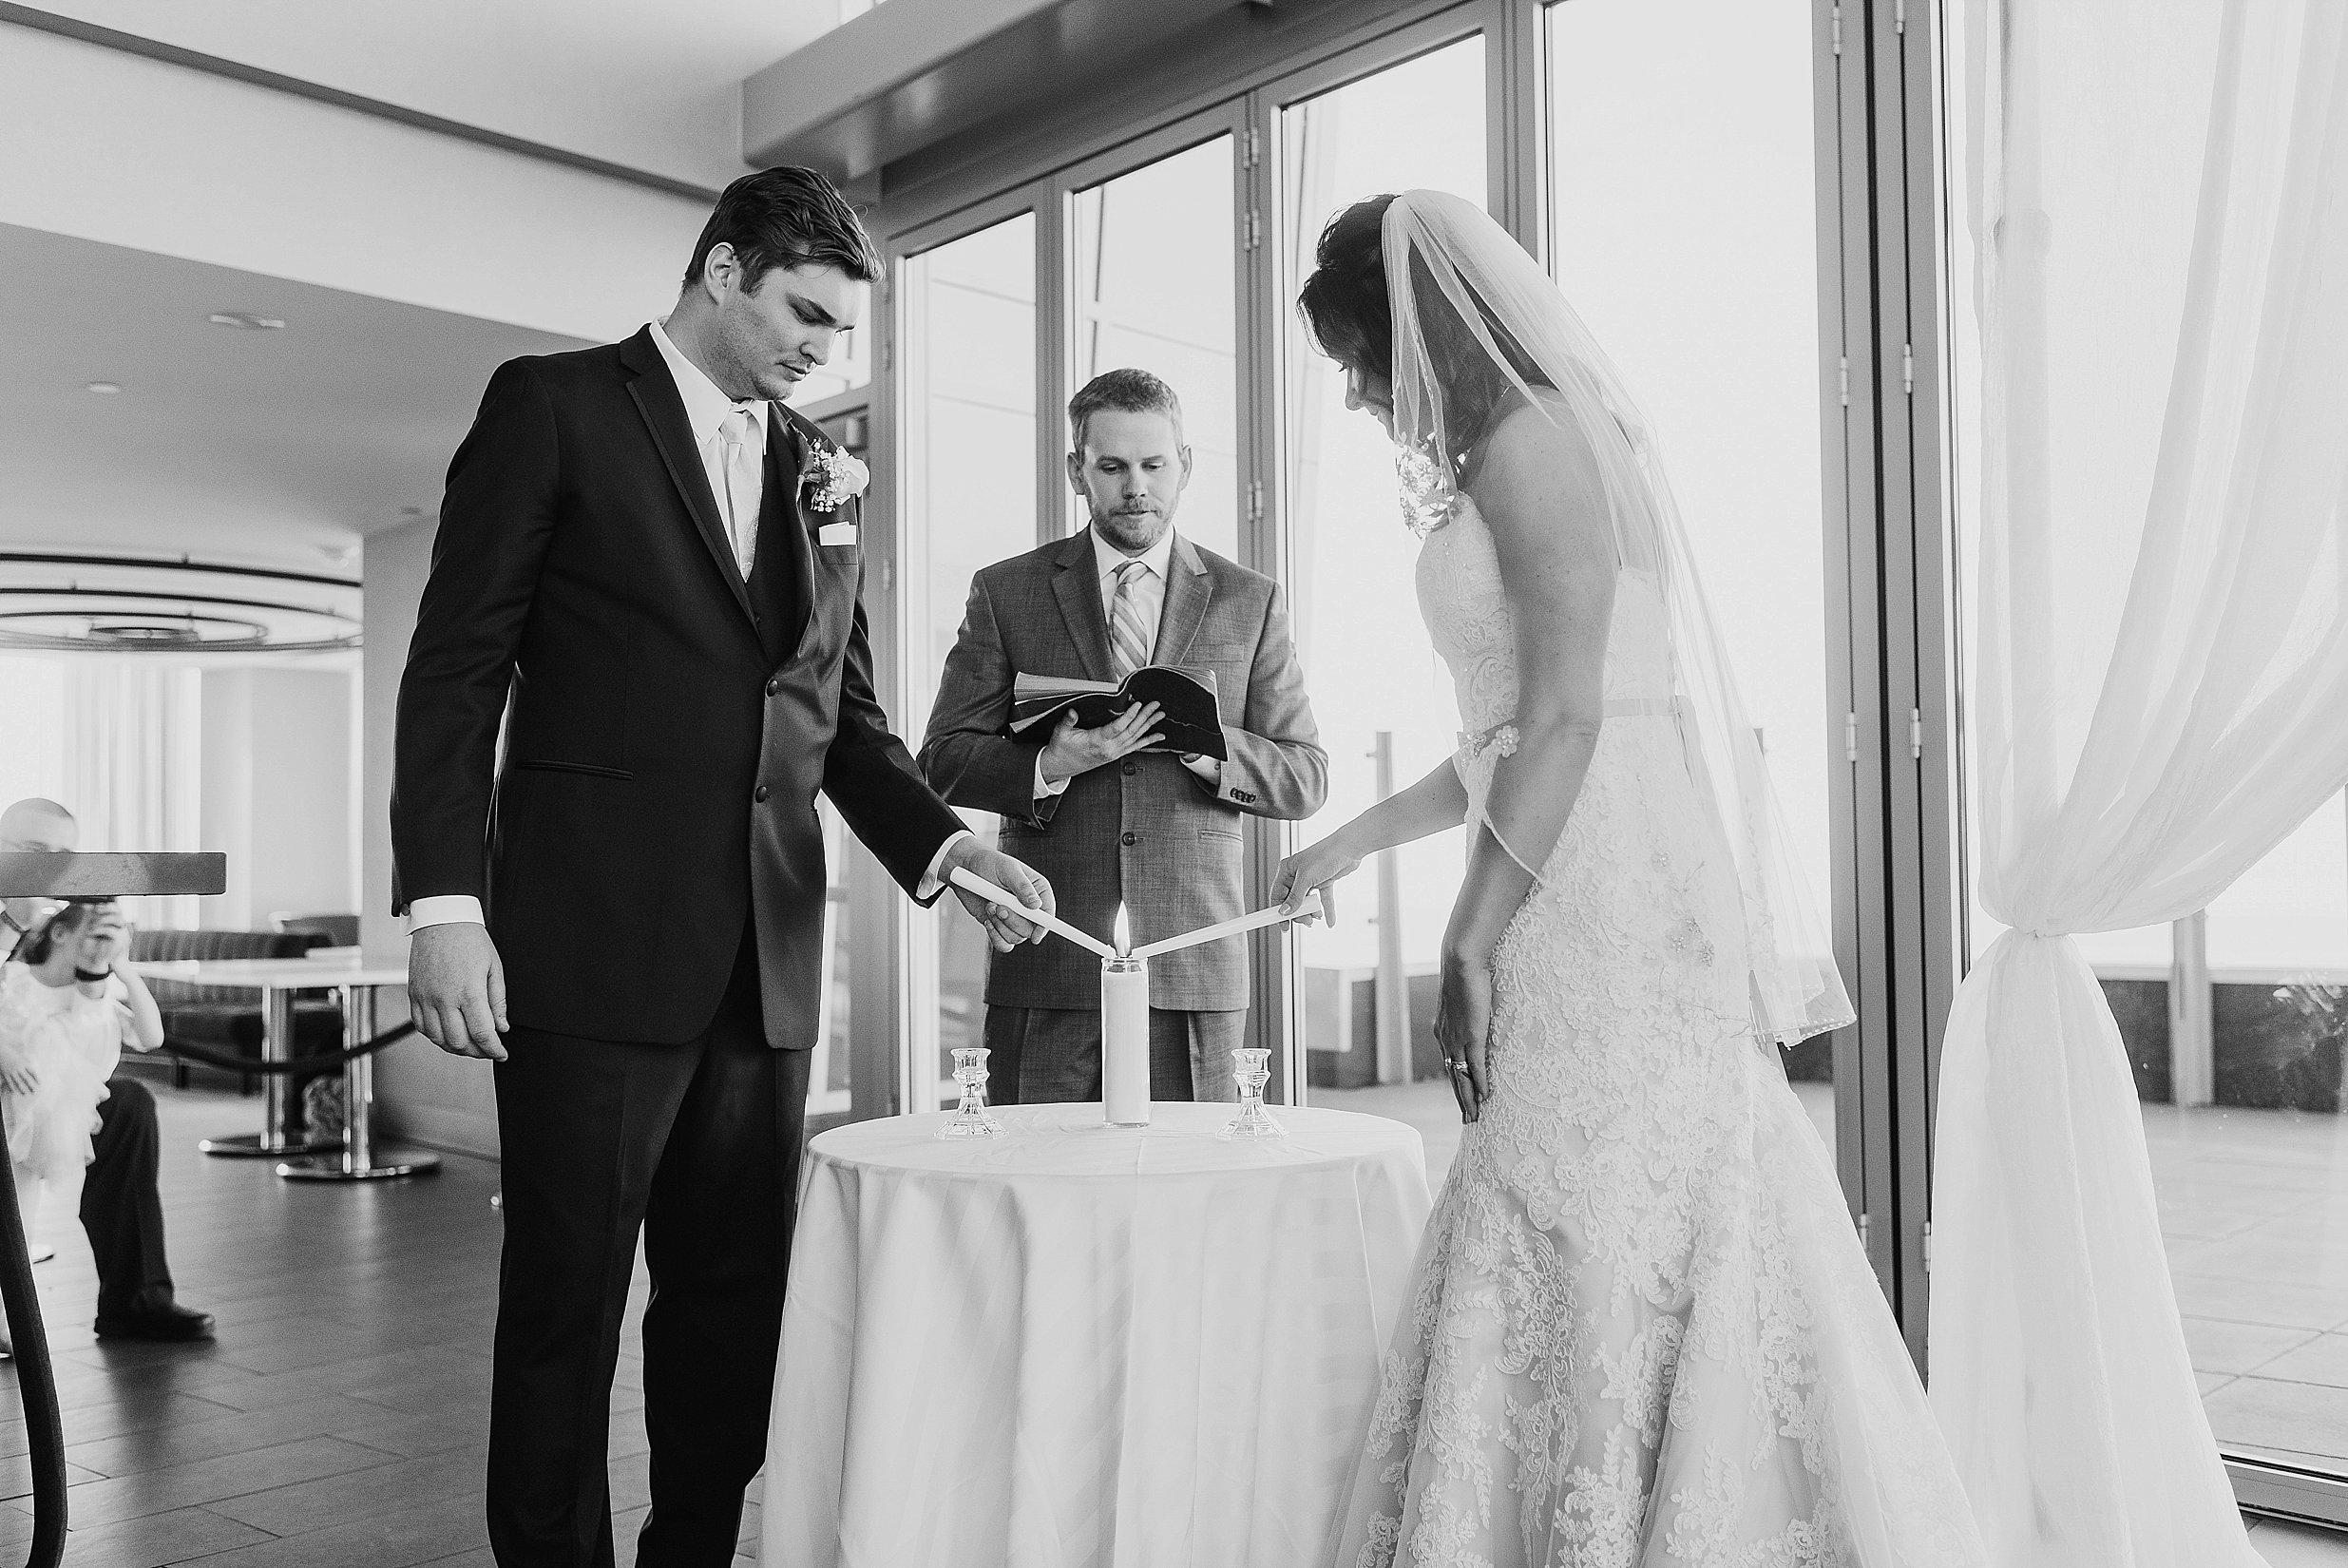 Hilton Downtown Cleveland Wedding0025.jpg